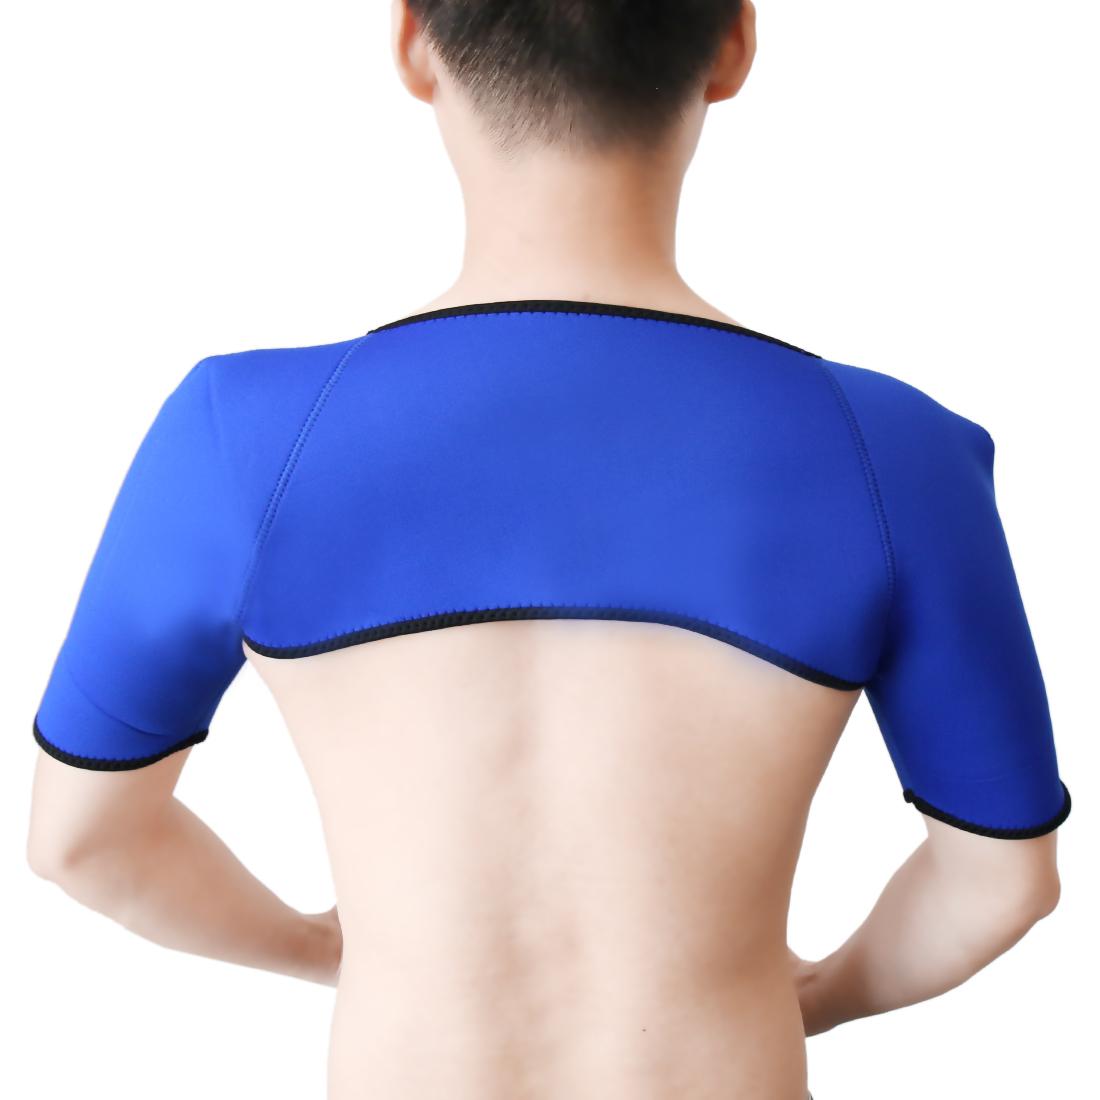 Blue L Size Neoprene Elastic Sports Injury Protect Both Shoulder Brace Support